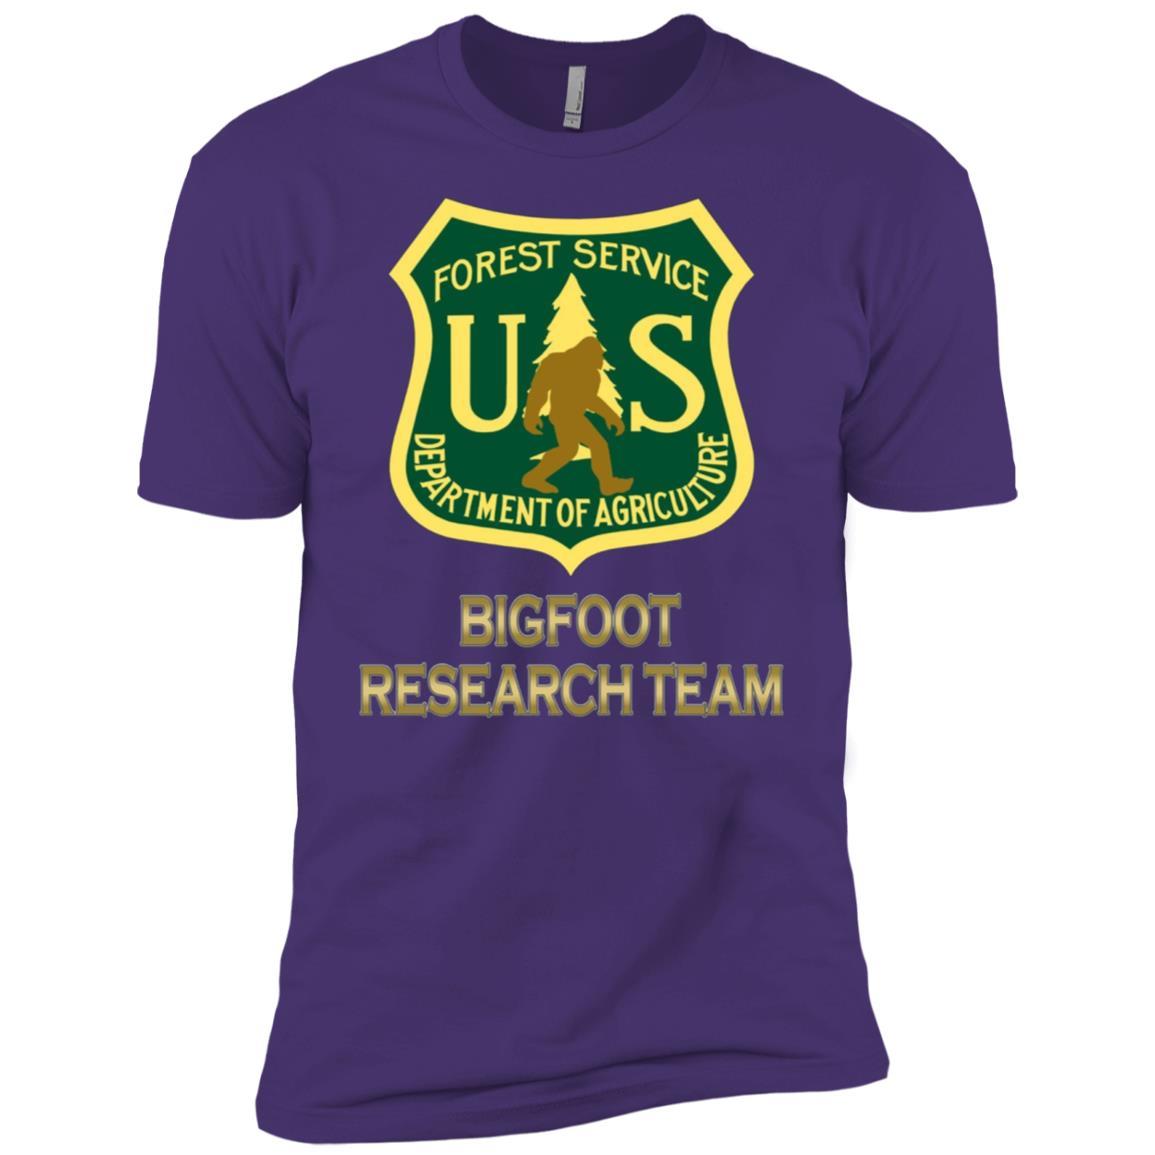 Bigfoot Research Team Funny Men Short Sleeve T-Shirt